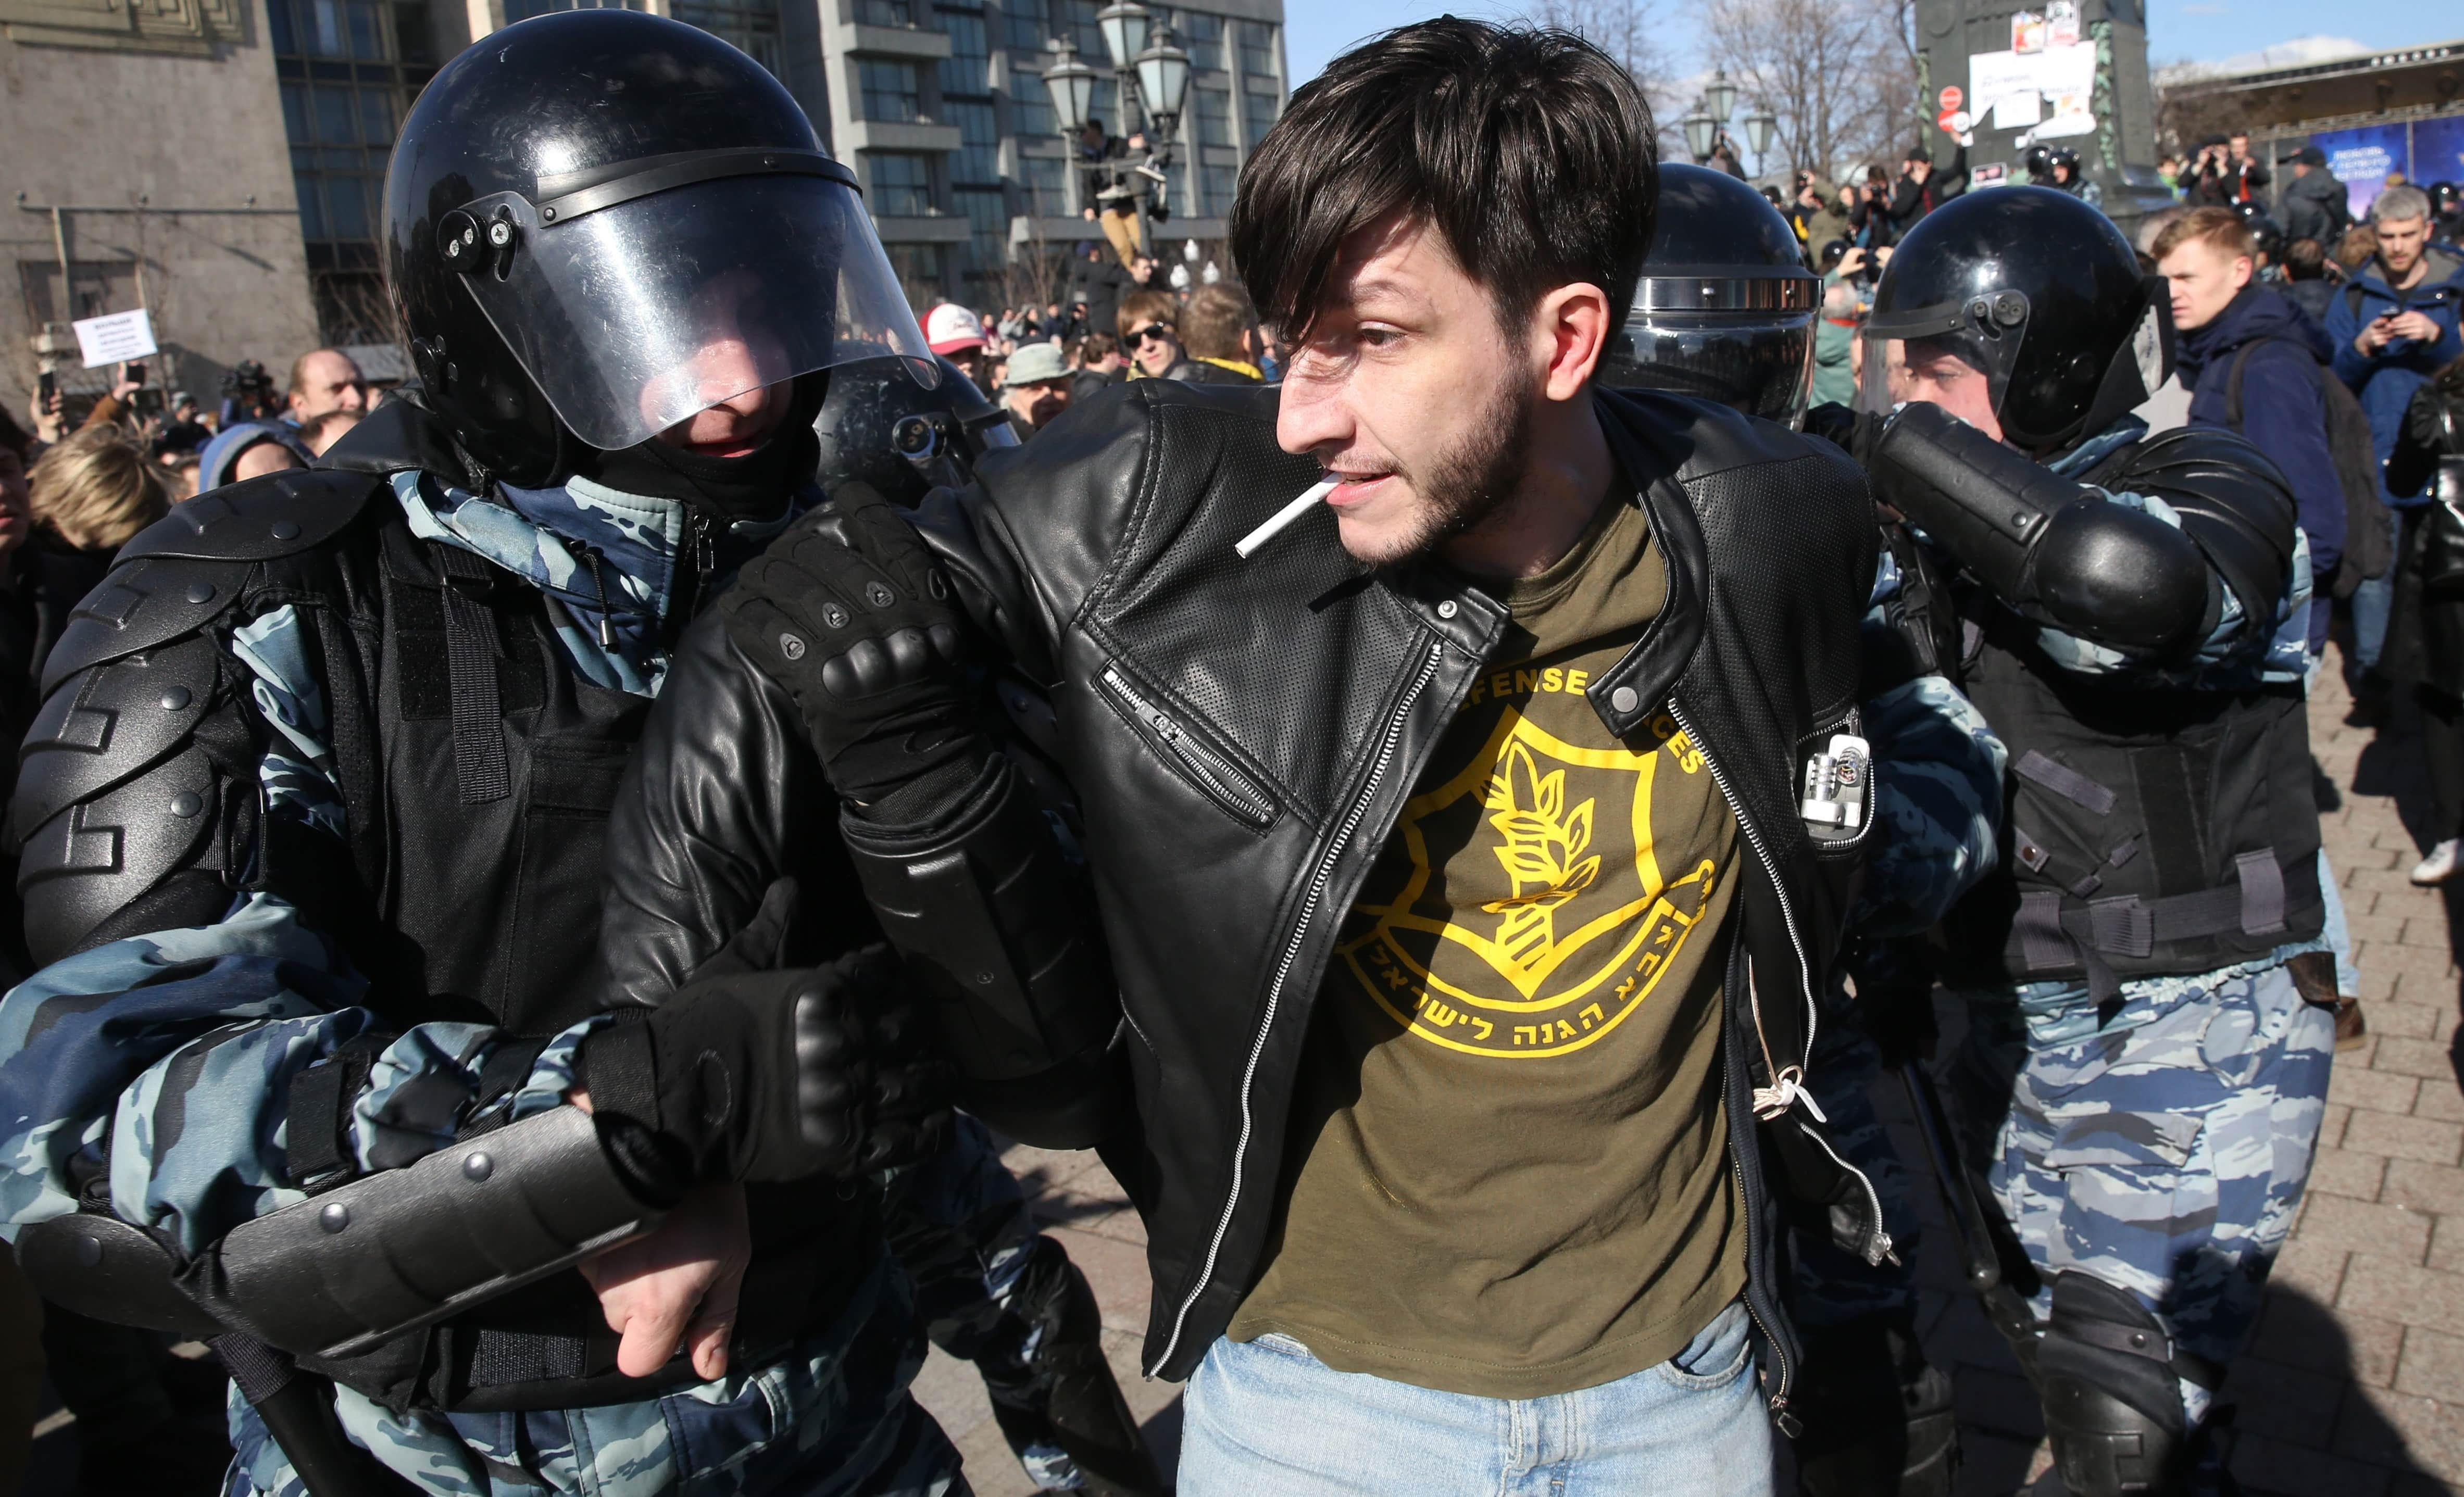 Photo: Getty Images/Mikhail Svetlov